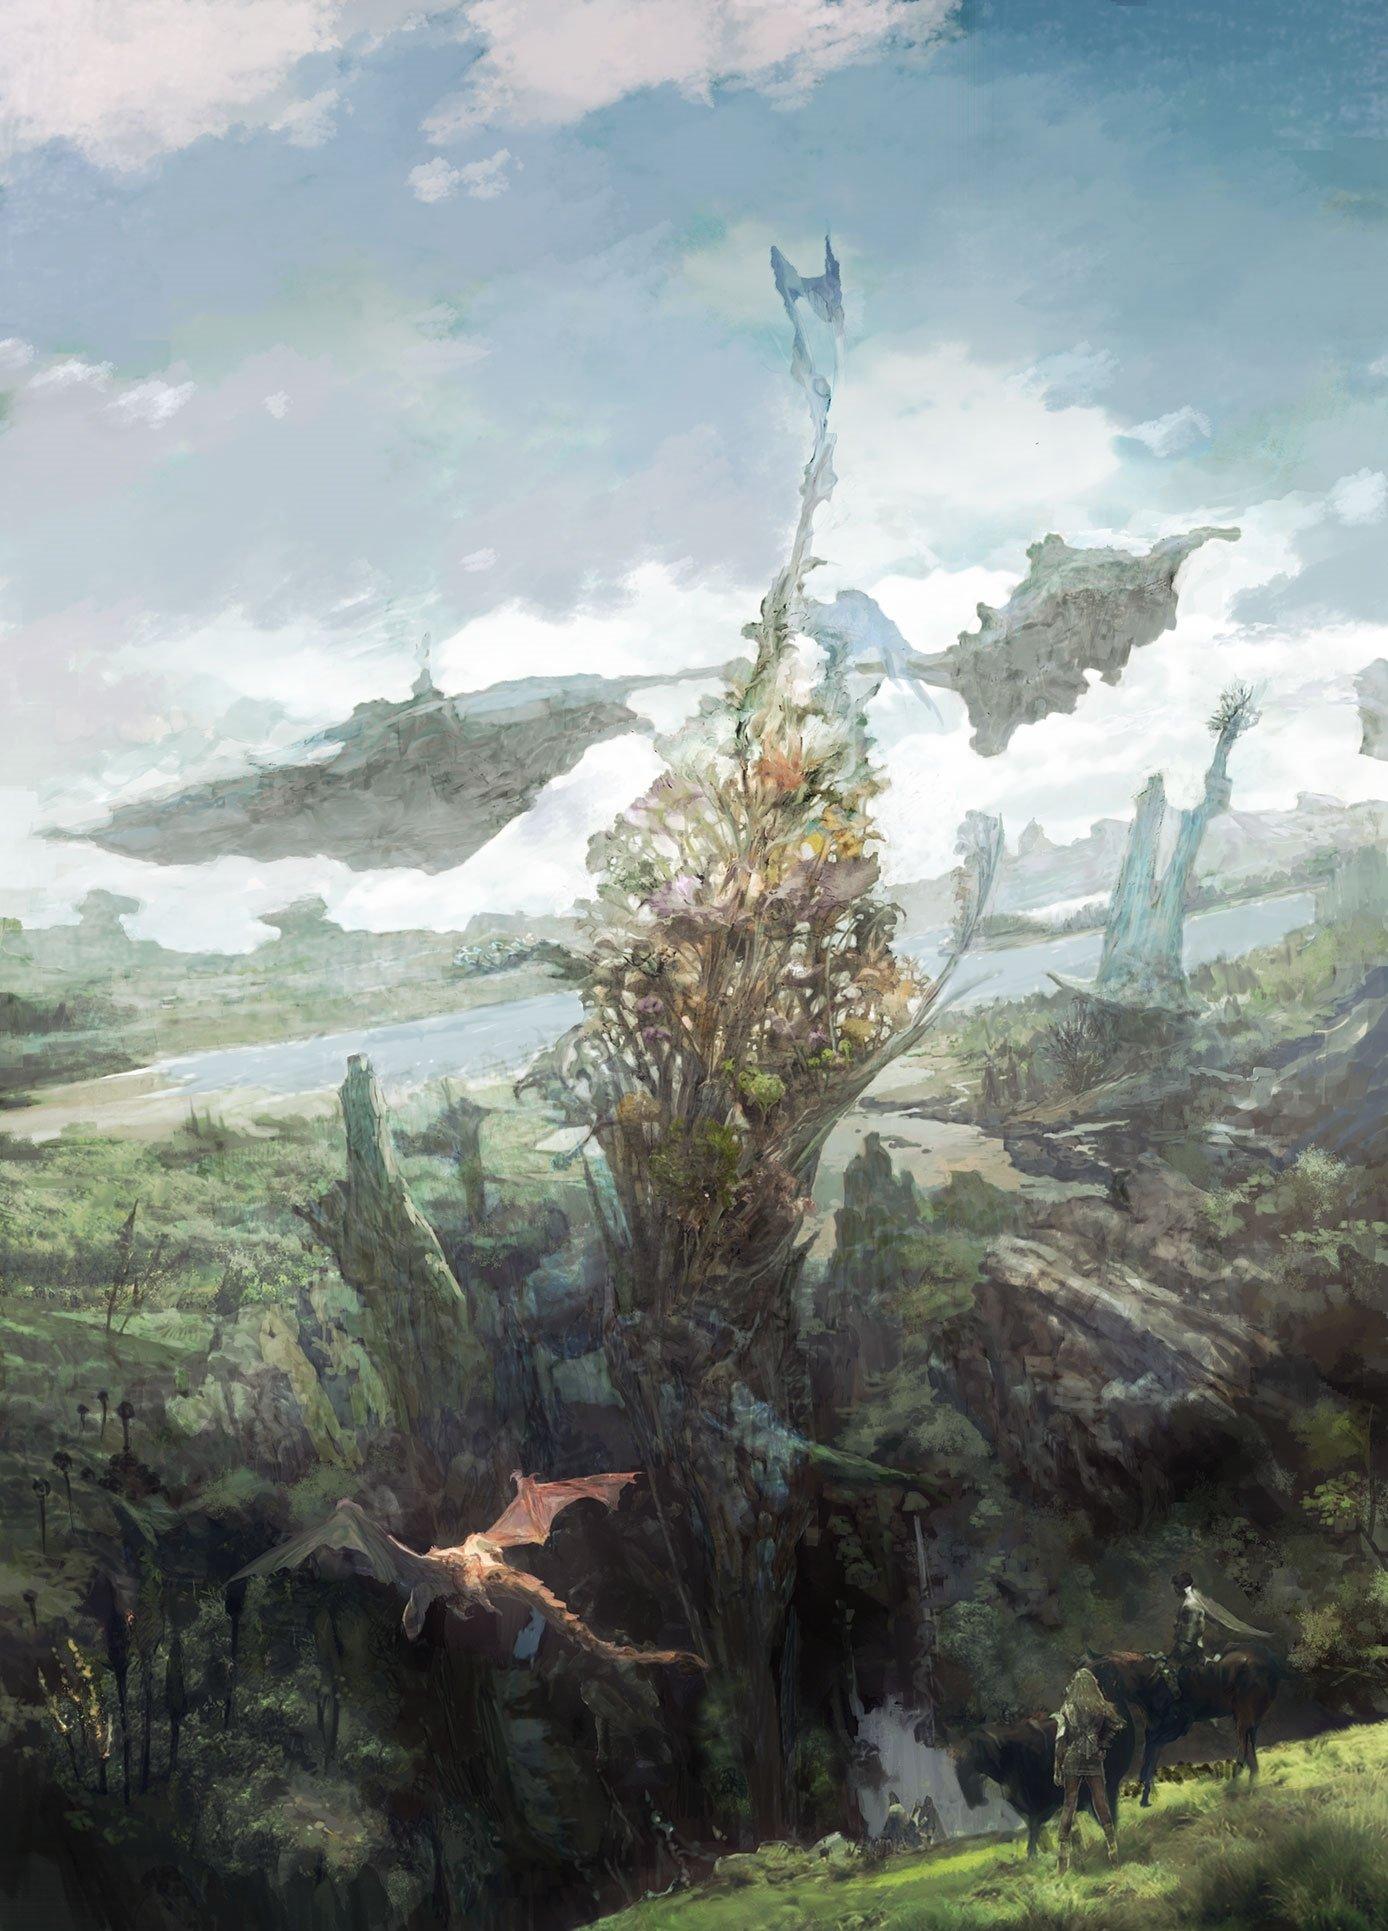 Square Enix Announces New Studio And Rpg